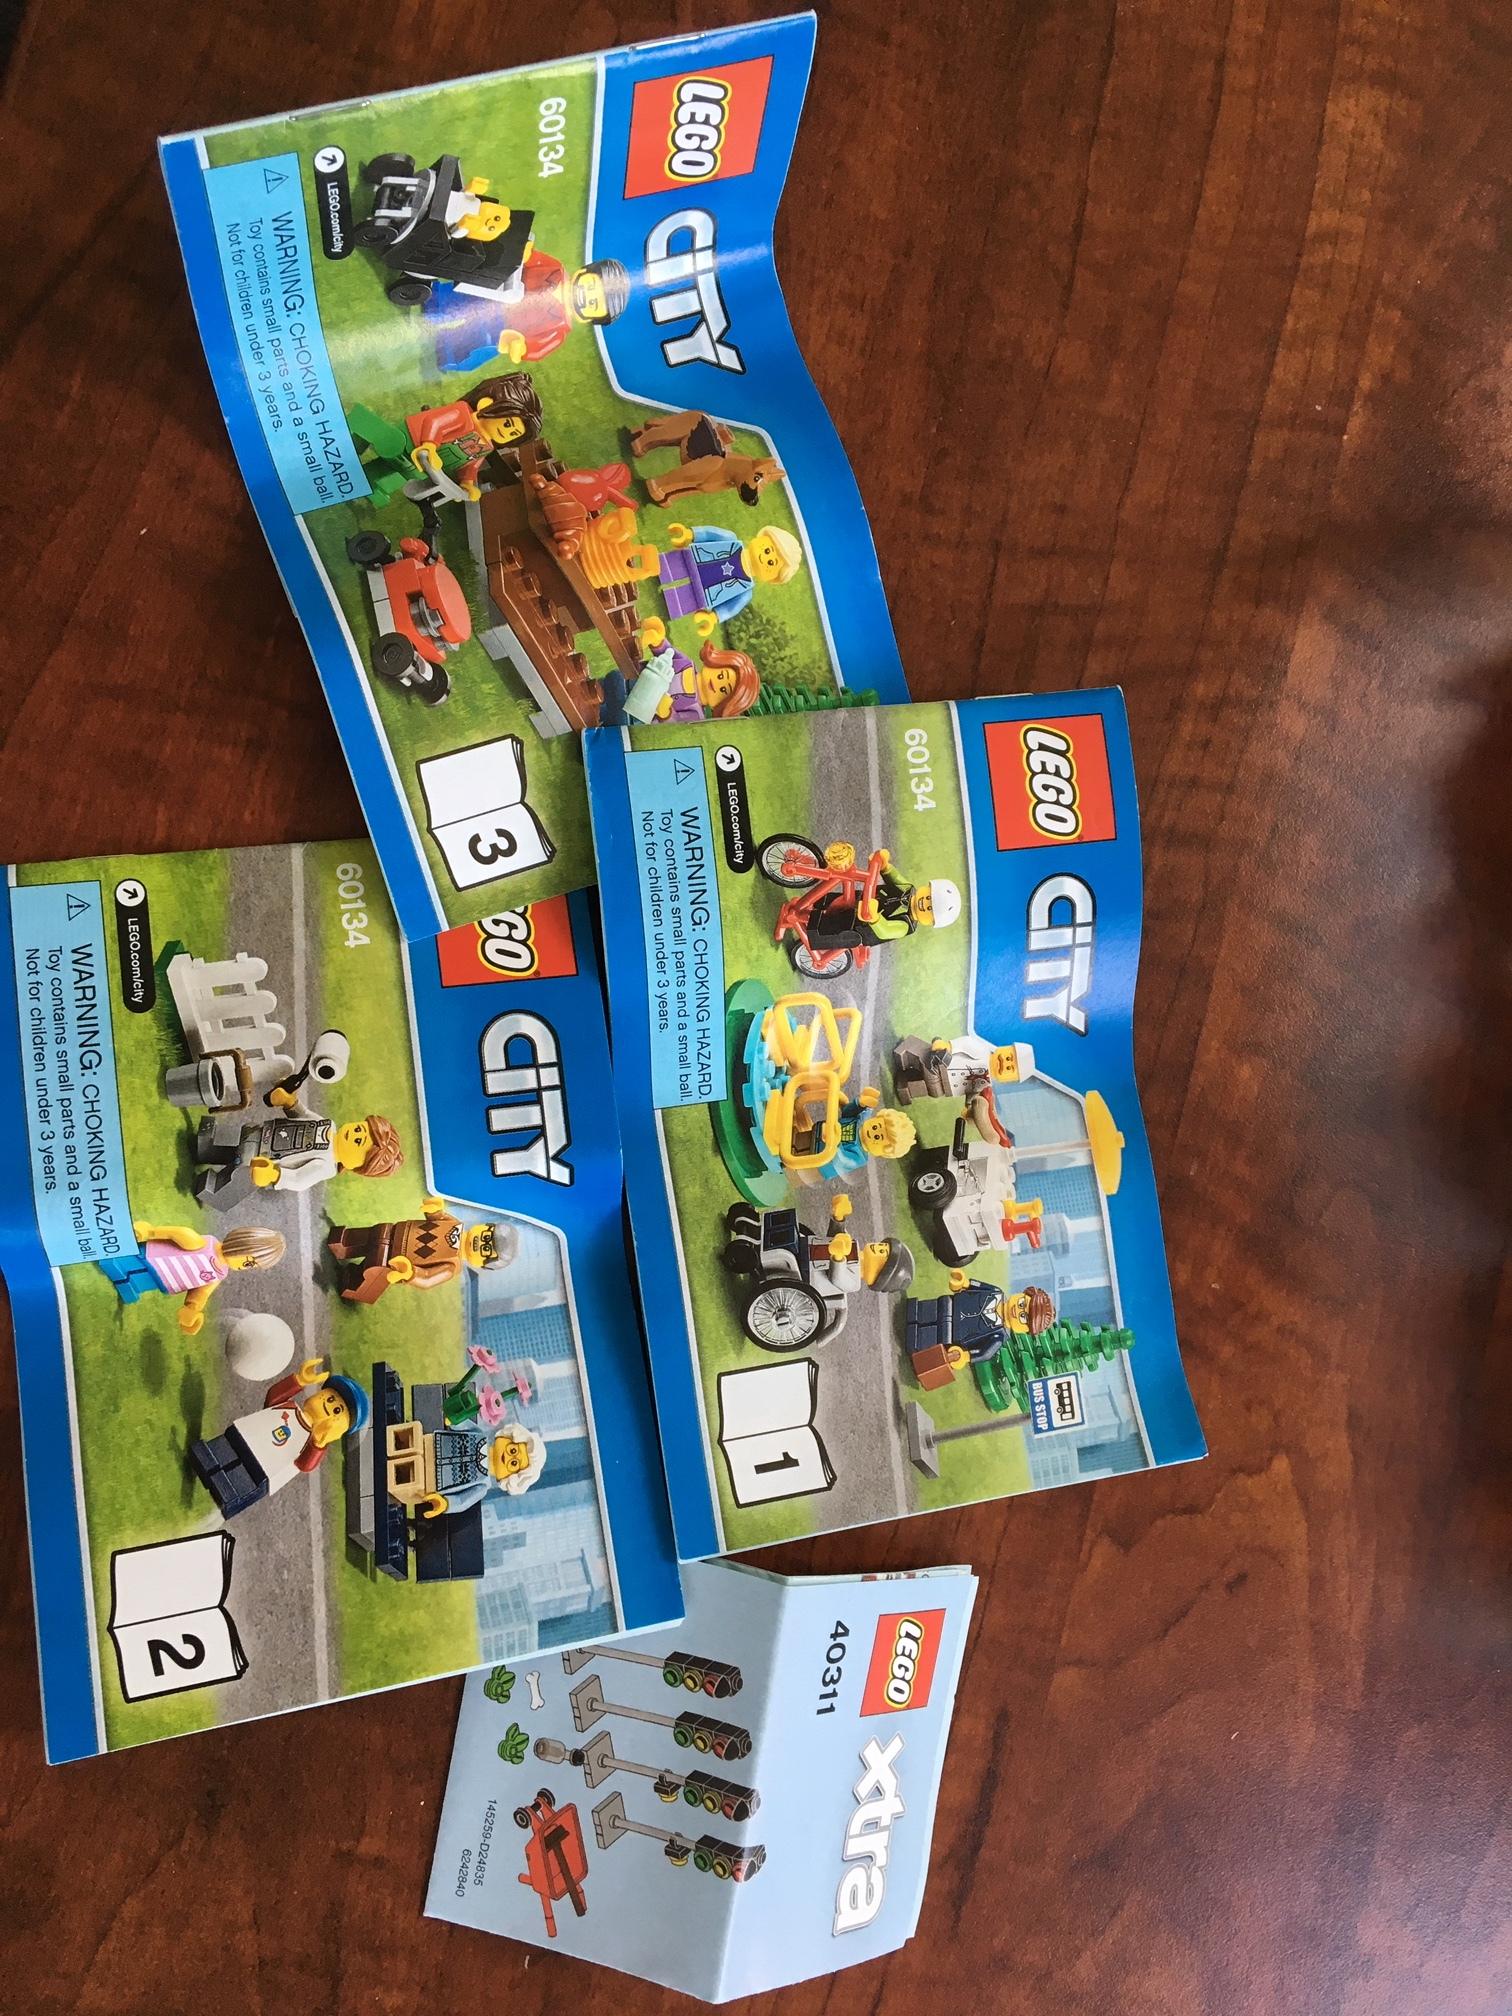 Lego™ building kit instructions